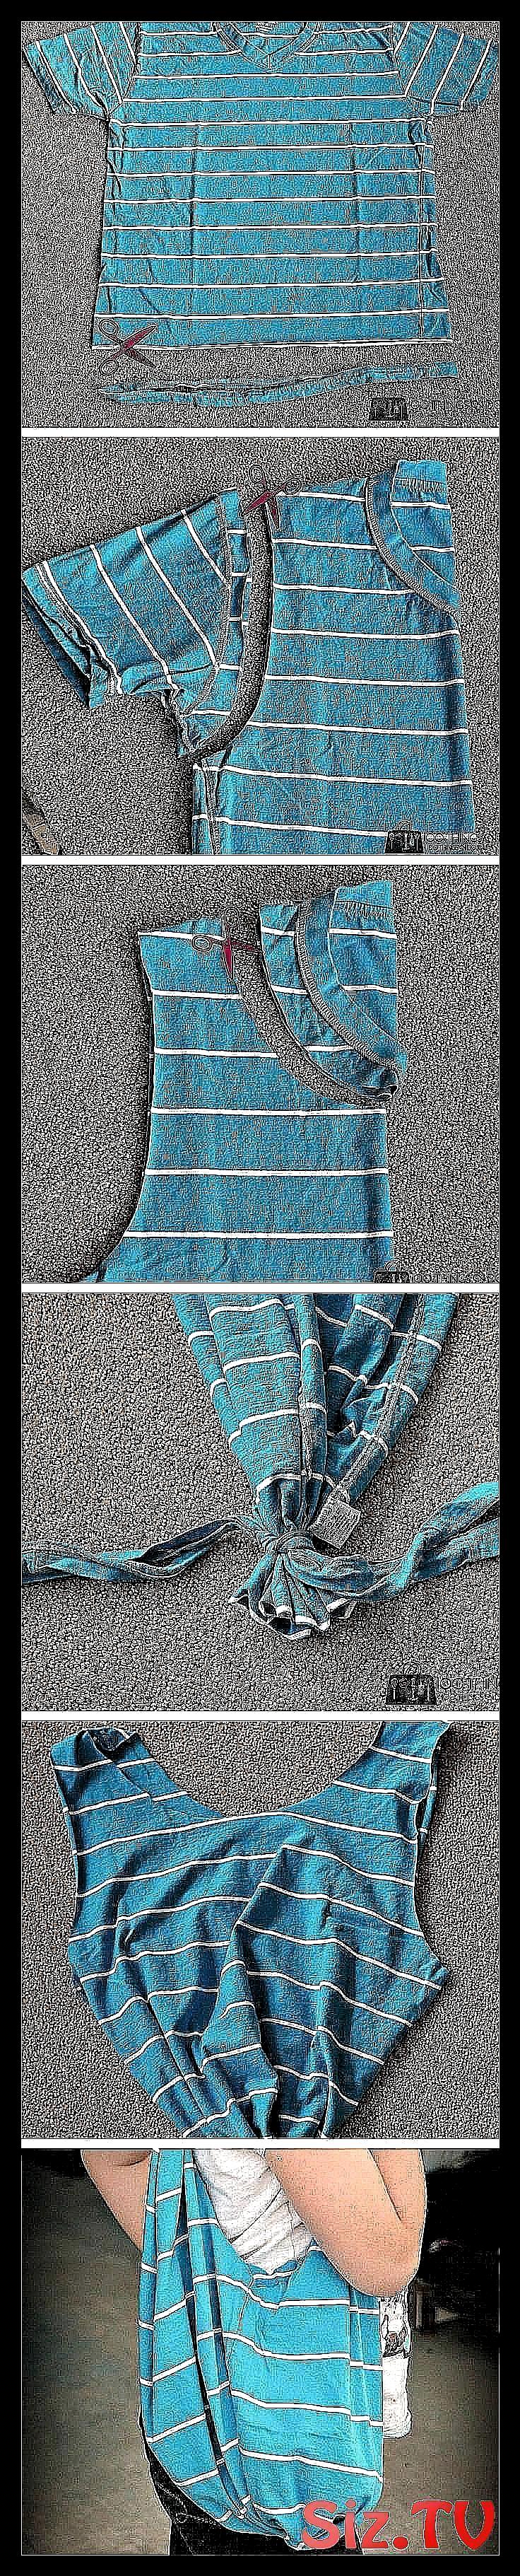 No-Sew T-shirt Bag No-Sew T-shirt bag photo tutori #bag #NoSew #photo #tshirt #T... No-Sew T-shirt Bag No-Sew T-shirt bag photo tutori #bag #NoSew #photo #tshirt #T… No-Sew T-shirt #SewingProjectsToSell